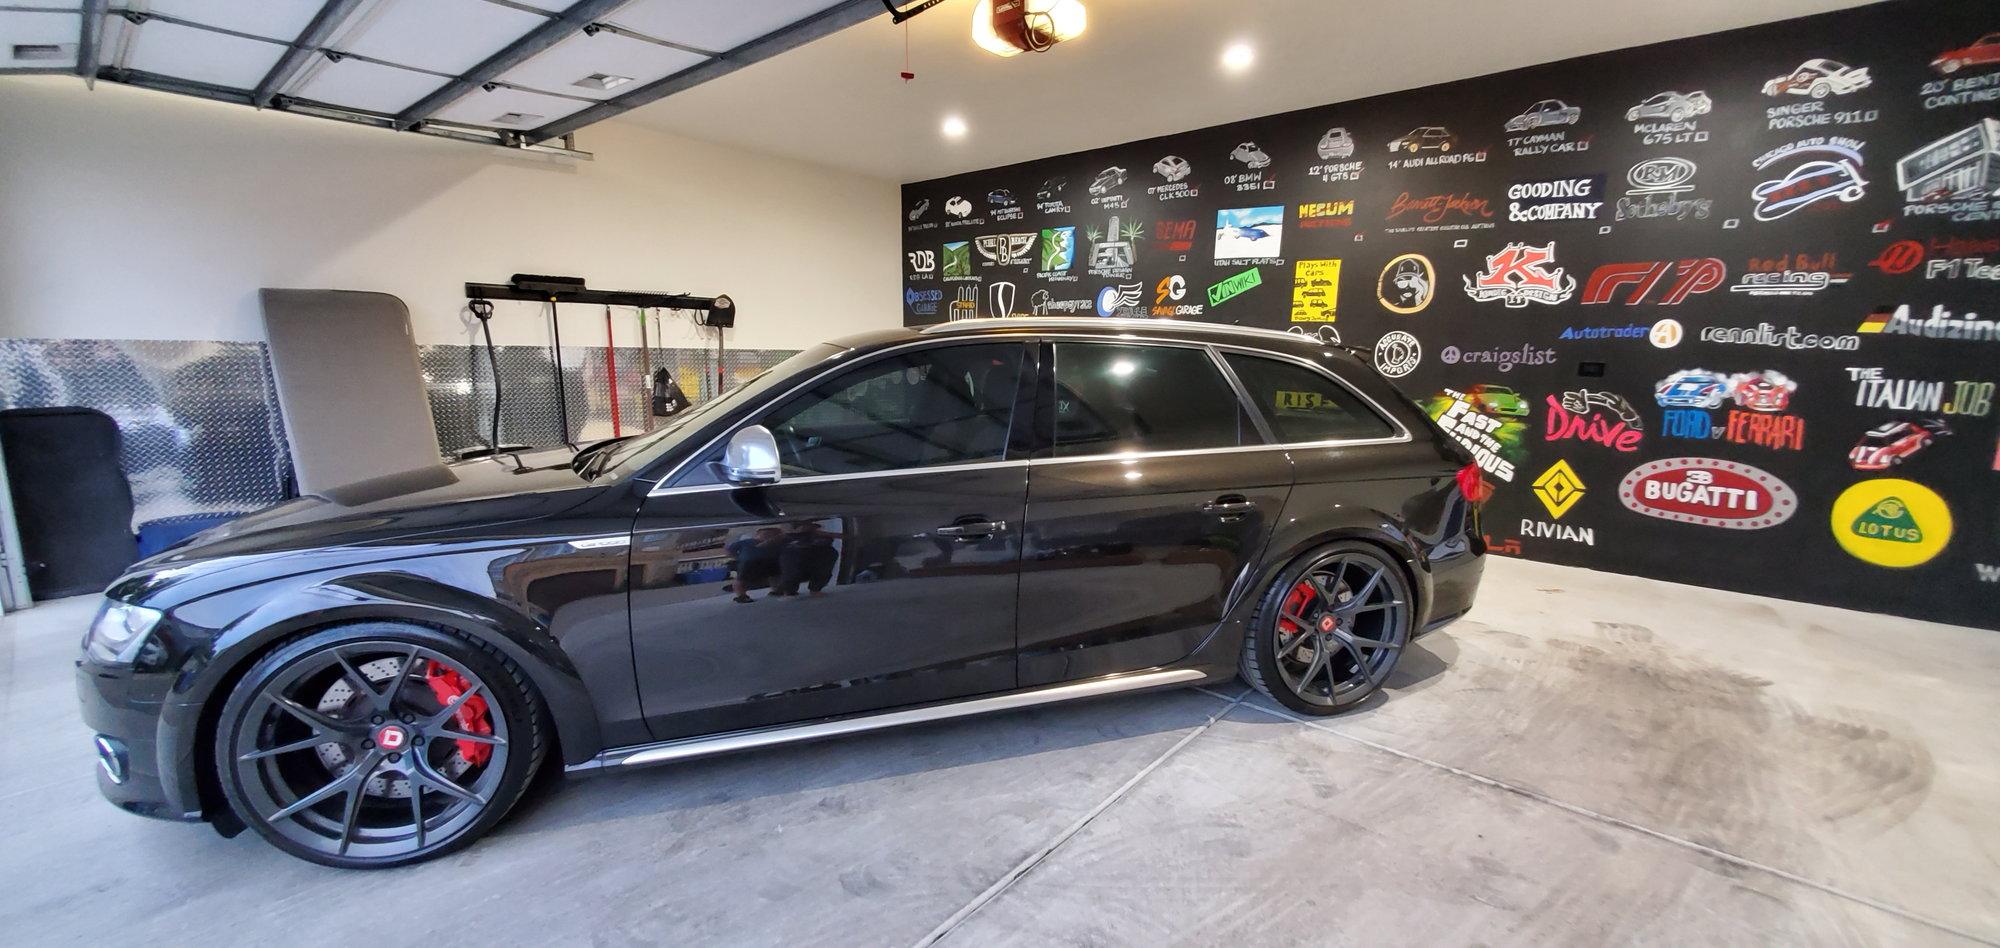 Custom Audi Allroad Prestige 1 Of 1 In The World Rennlist Porsche Discussion Forums